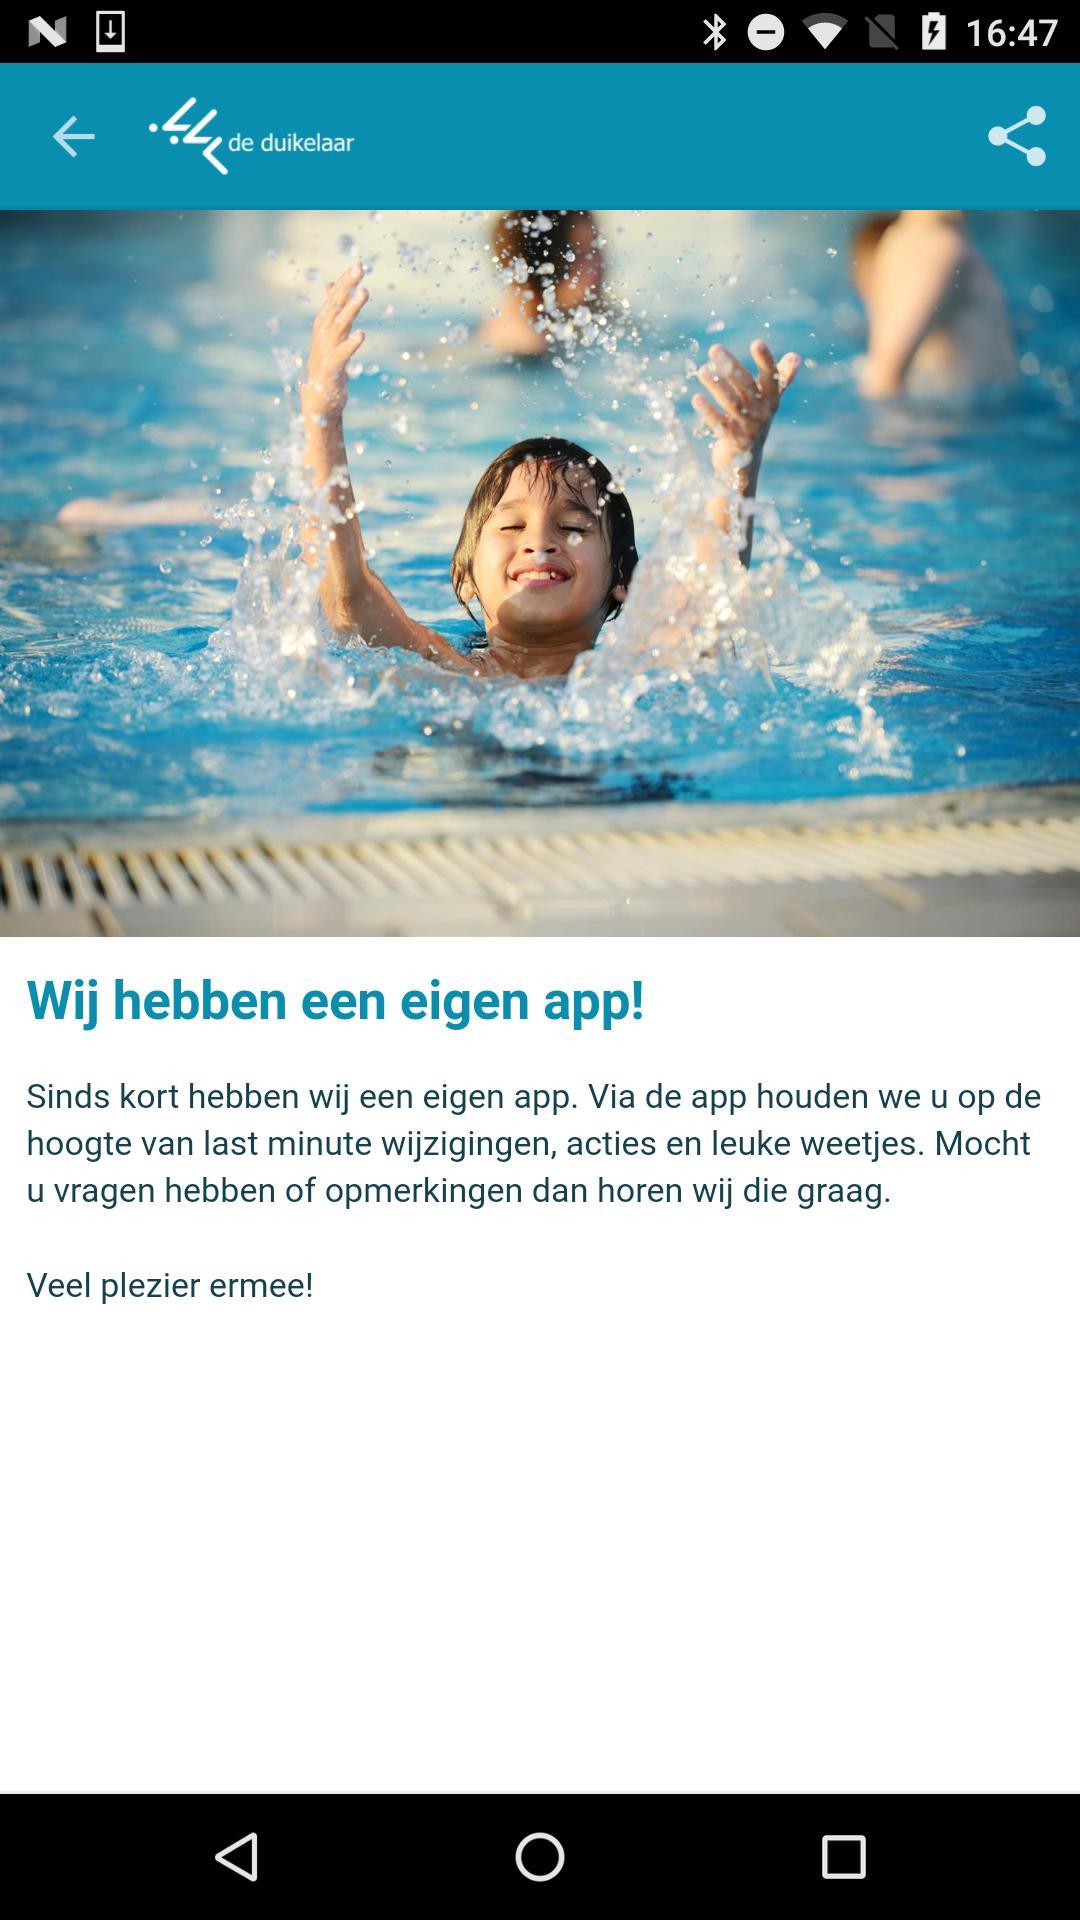 Zwembad De Duikelaar.Zwembad De Duikelaar For Android Apk Download